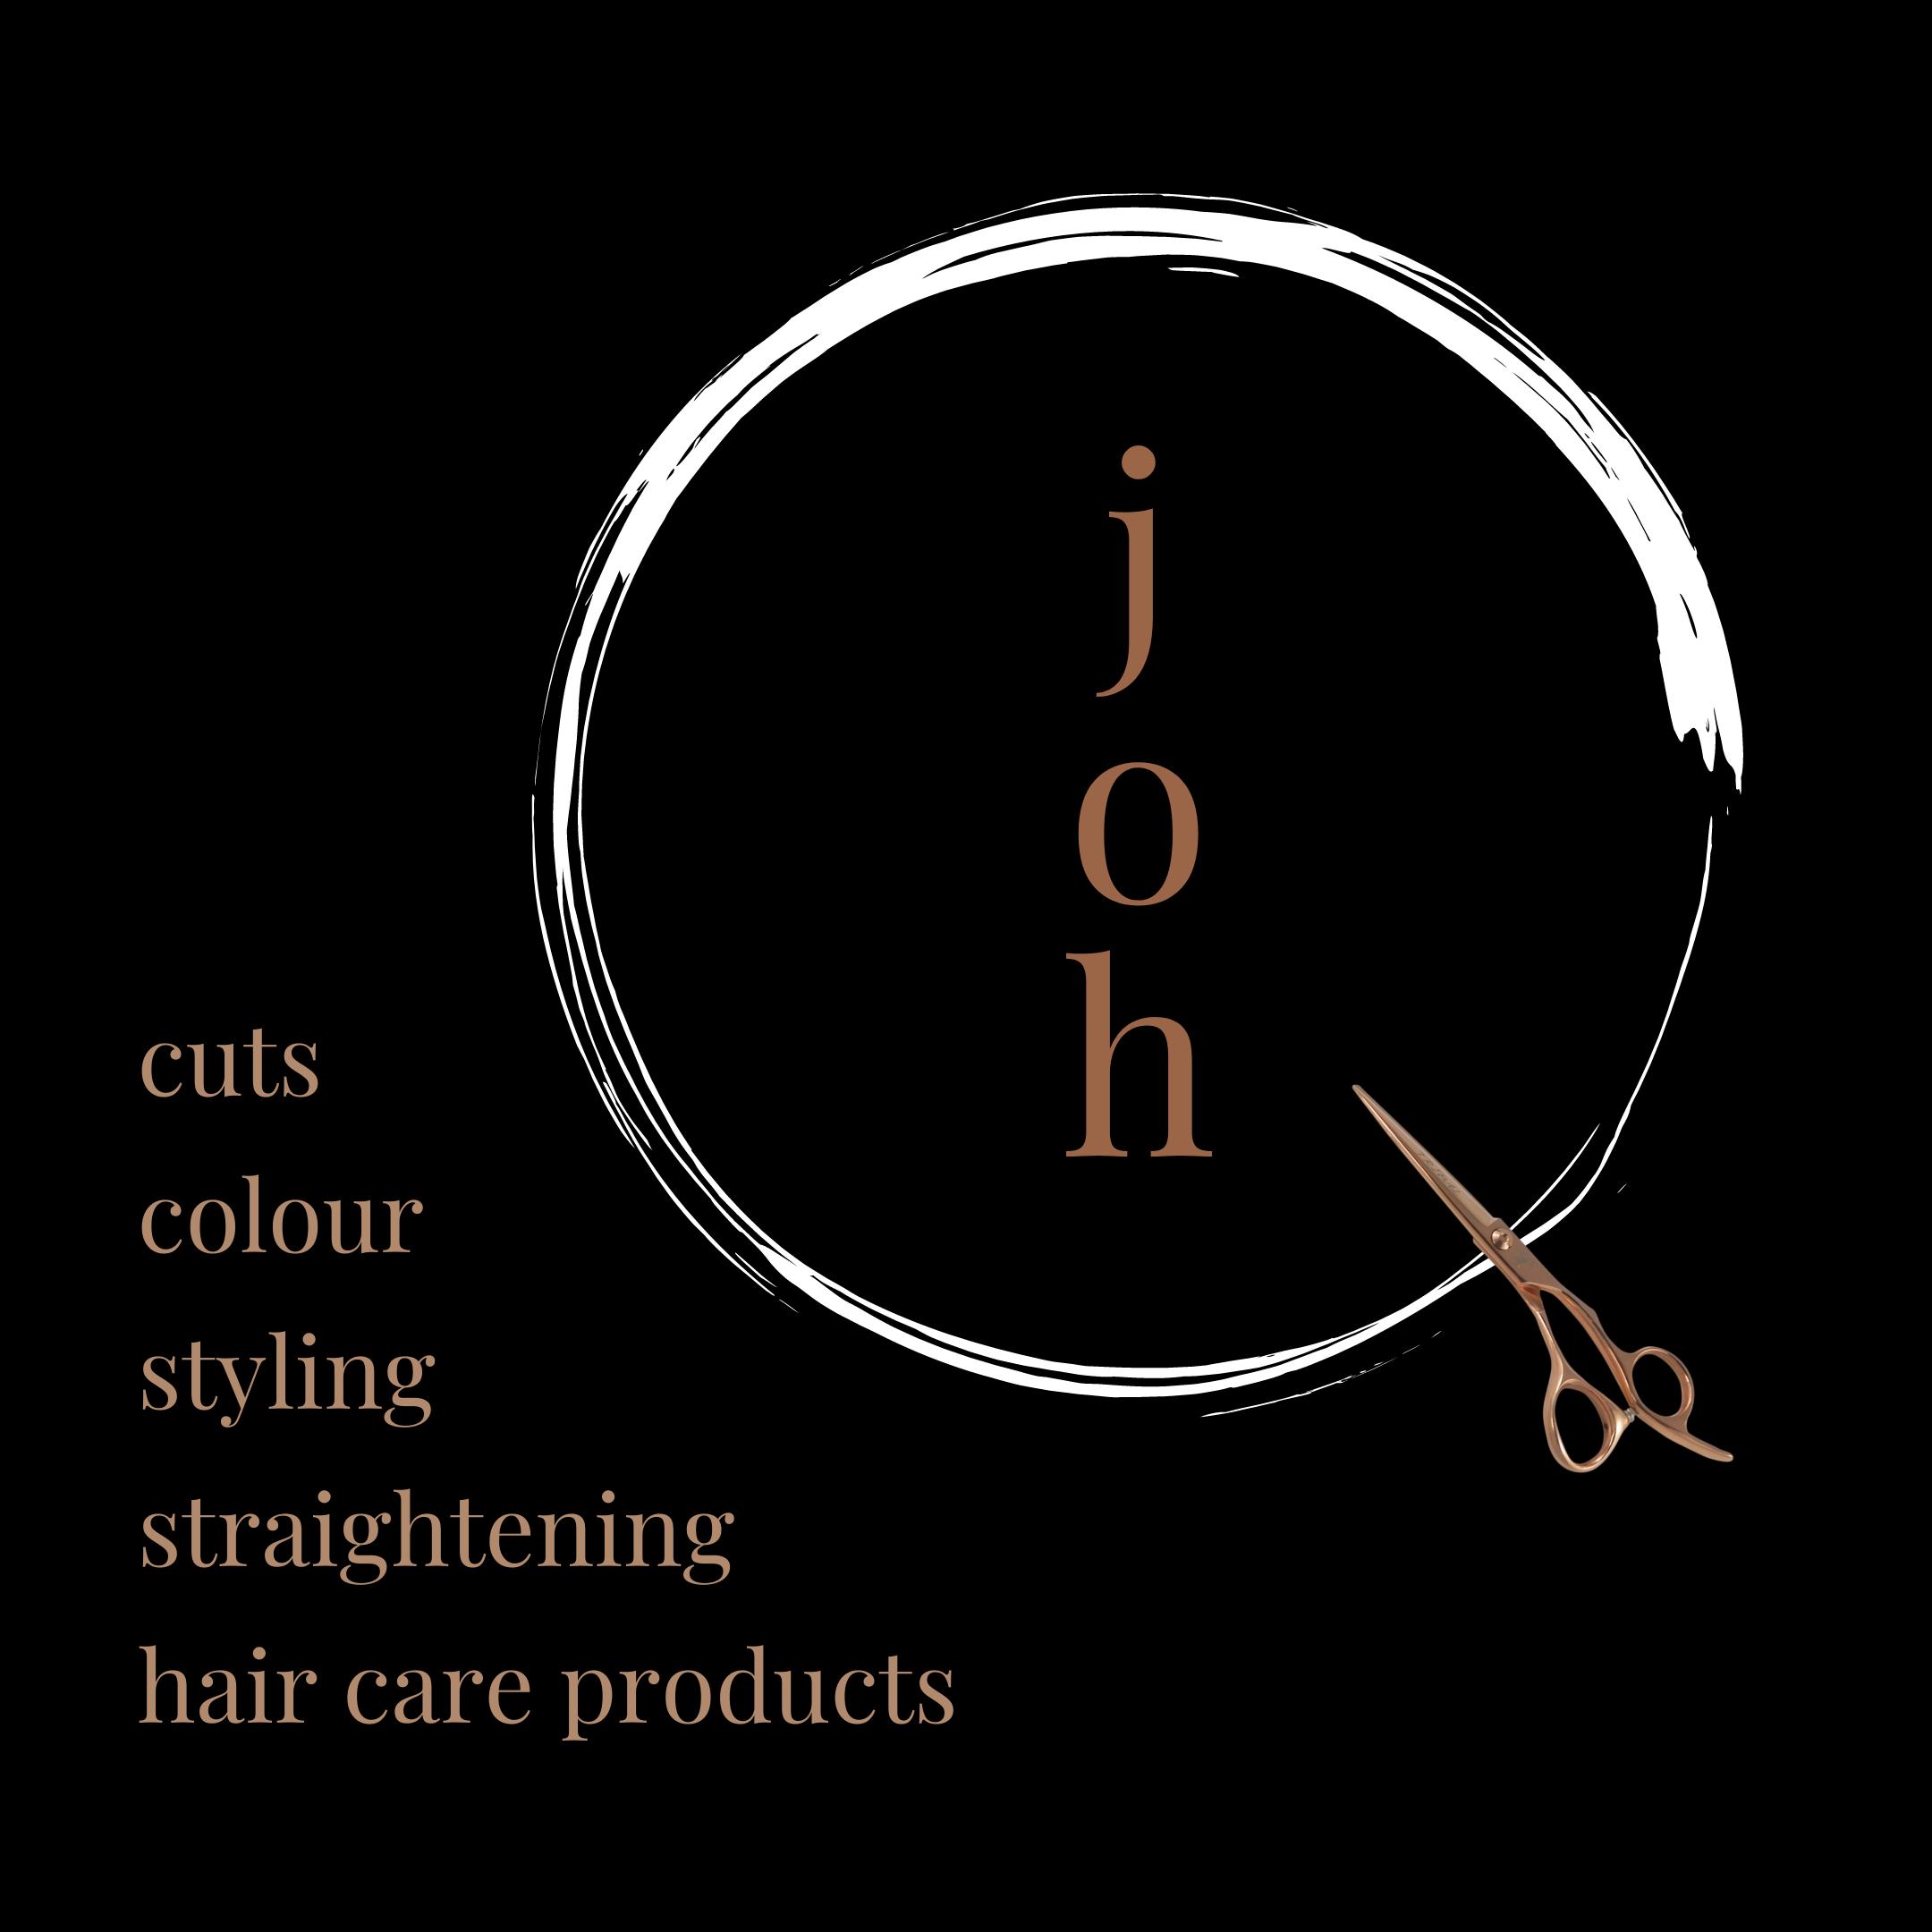 joh salon jenni oliver hairdressing